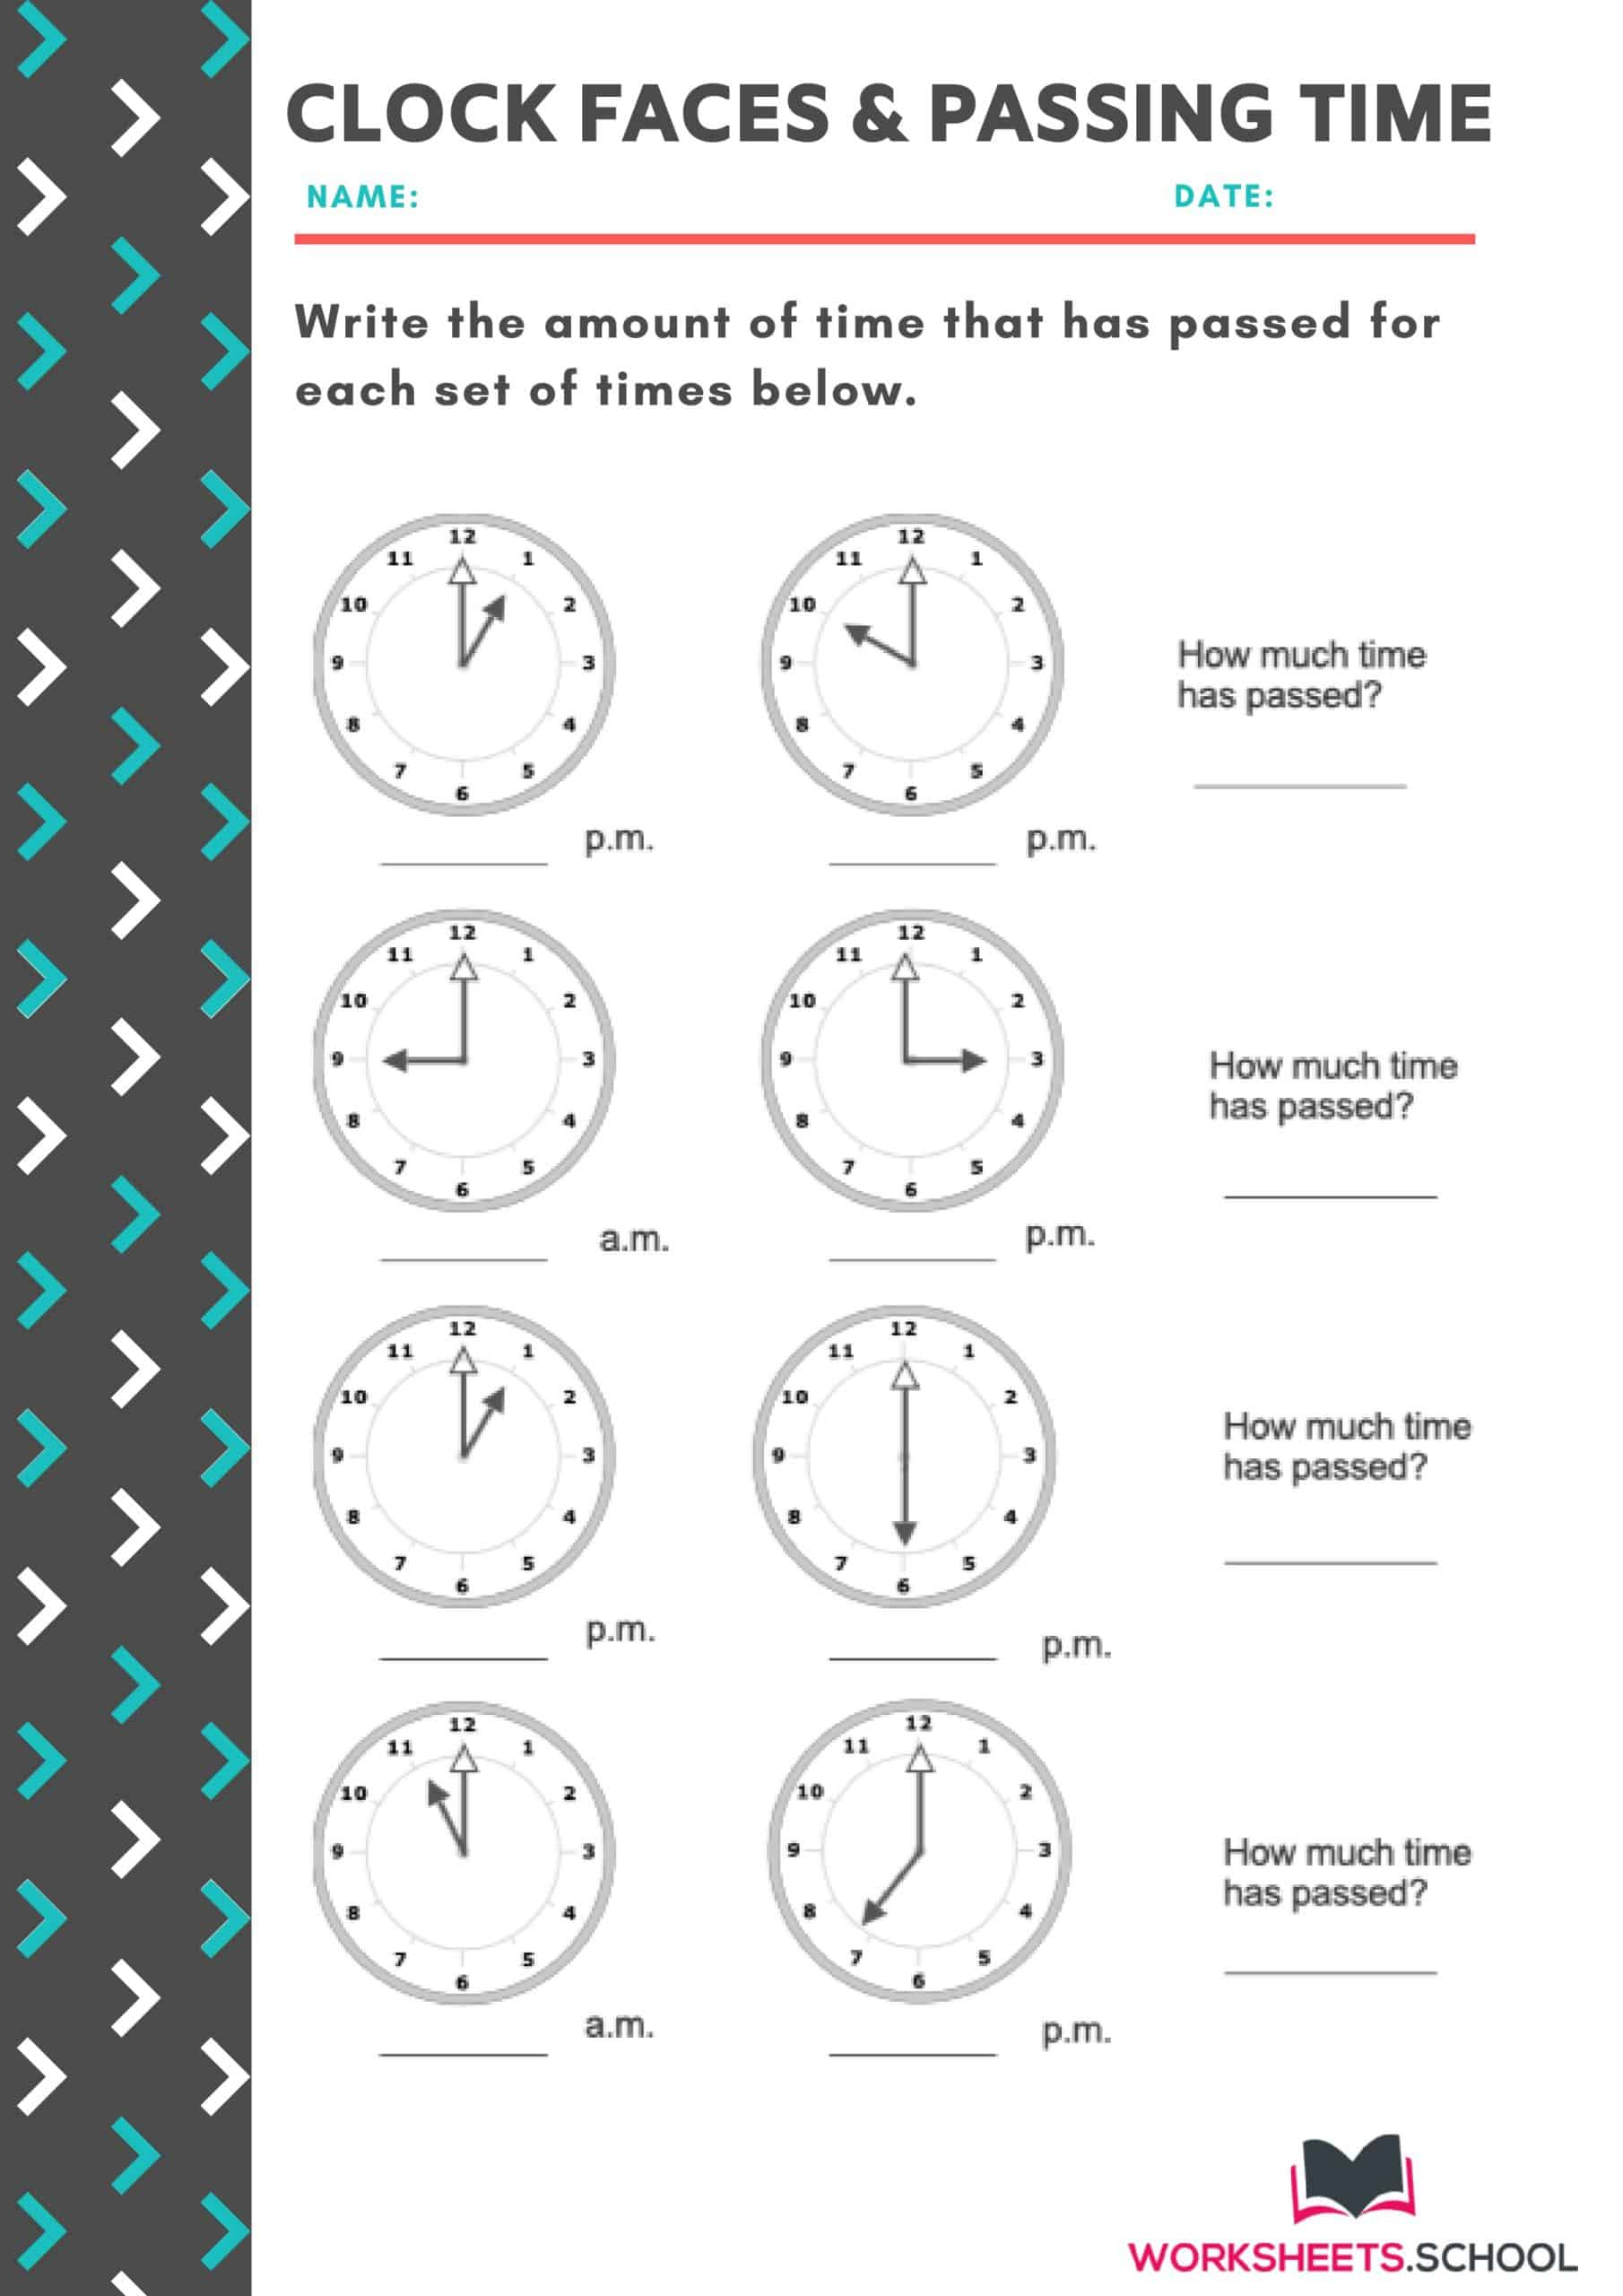 Clock Faces & Passing Time-Worksheet